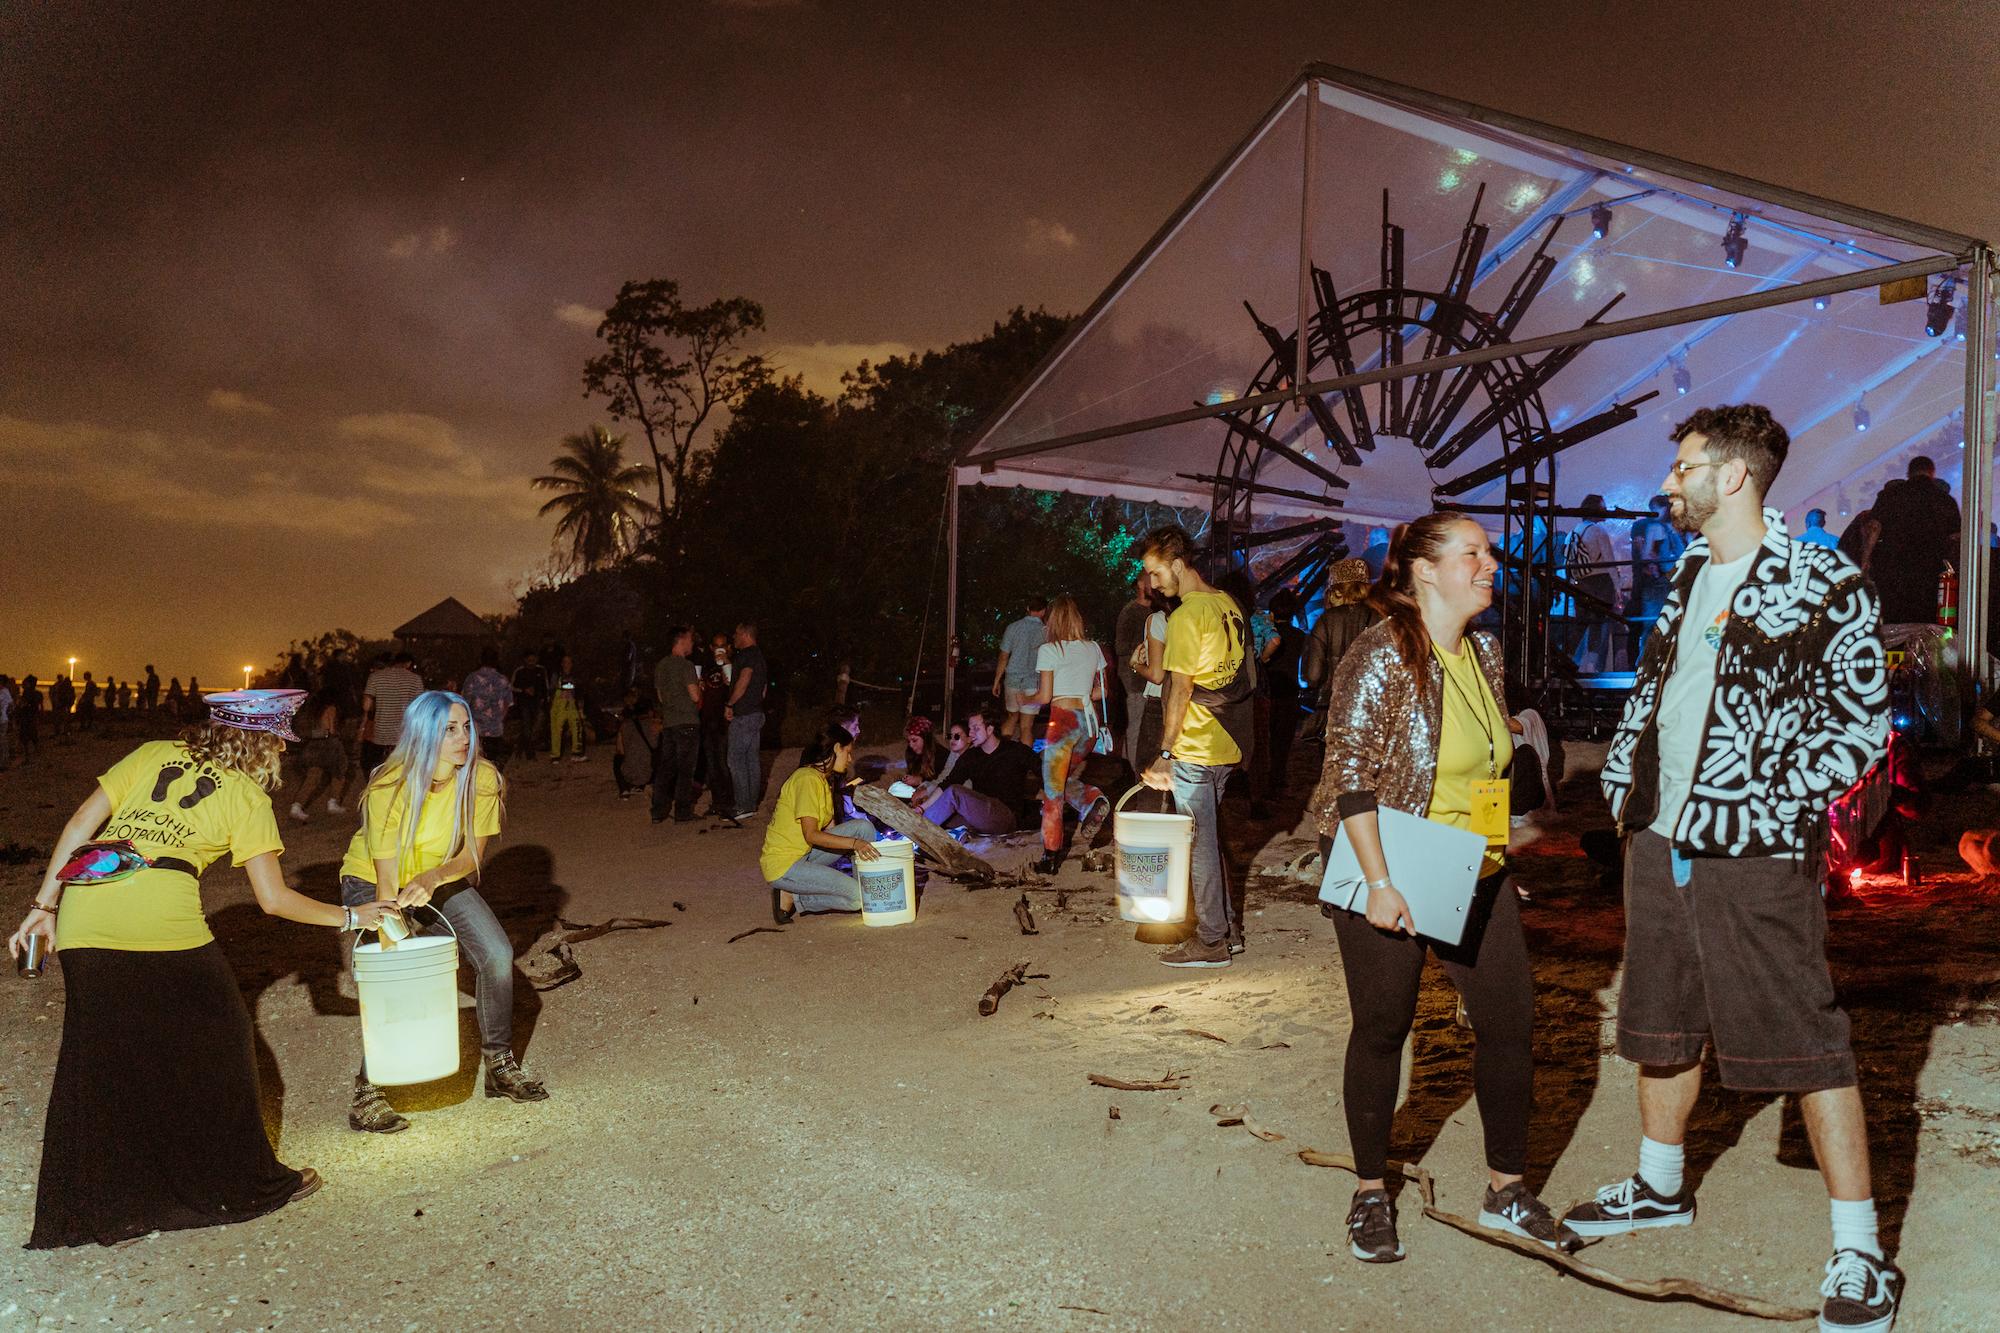 Cleaning up Rakastella Festival in Miami